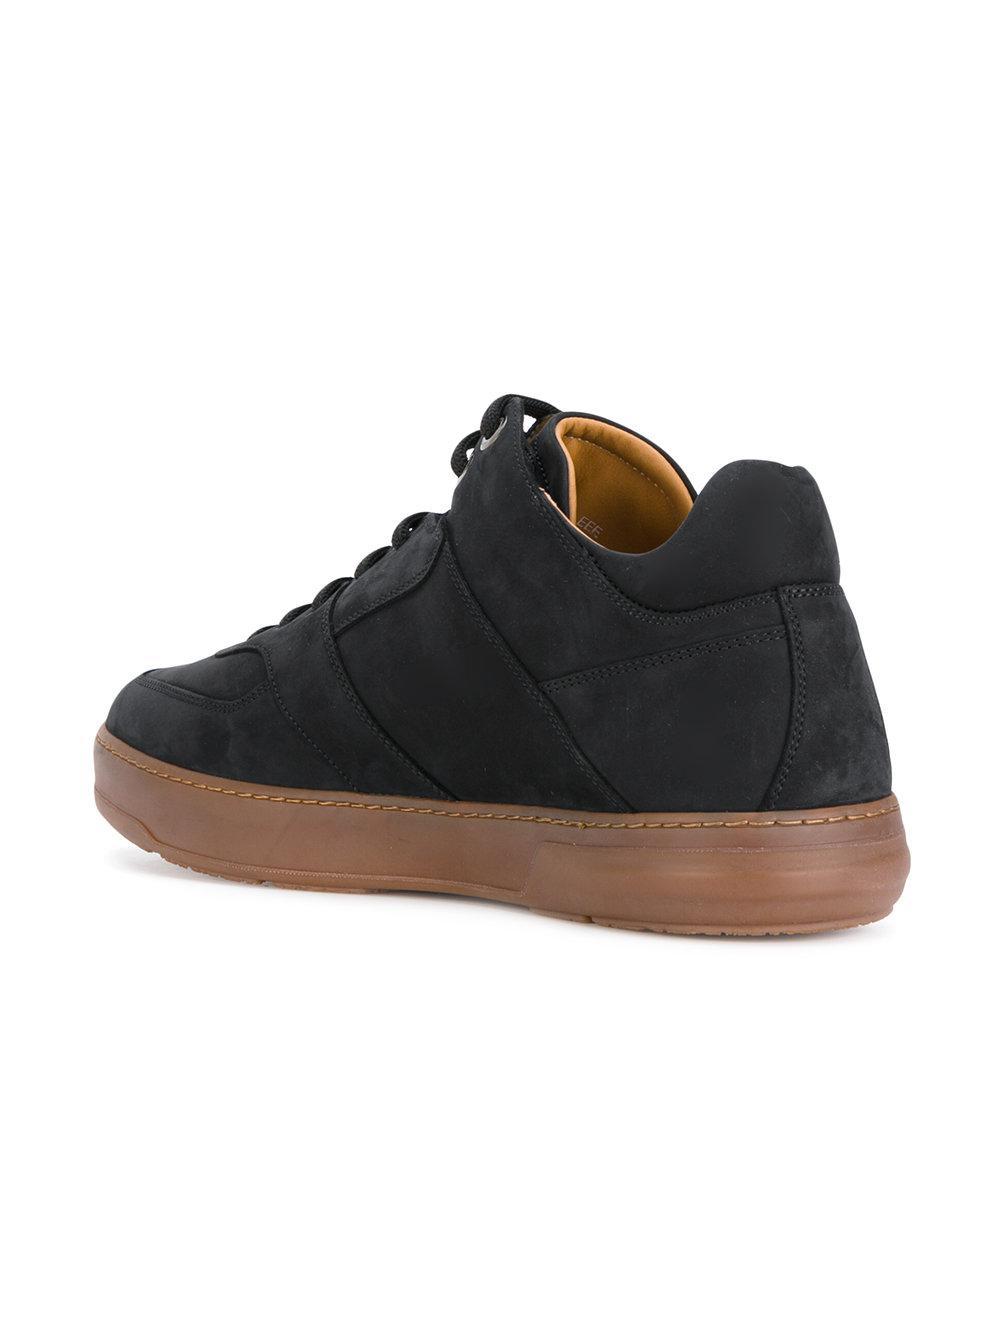 fa3e7c872b472 Lyst - Ferragamo Monroe Sneakers in Black for Men